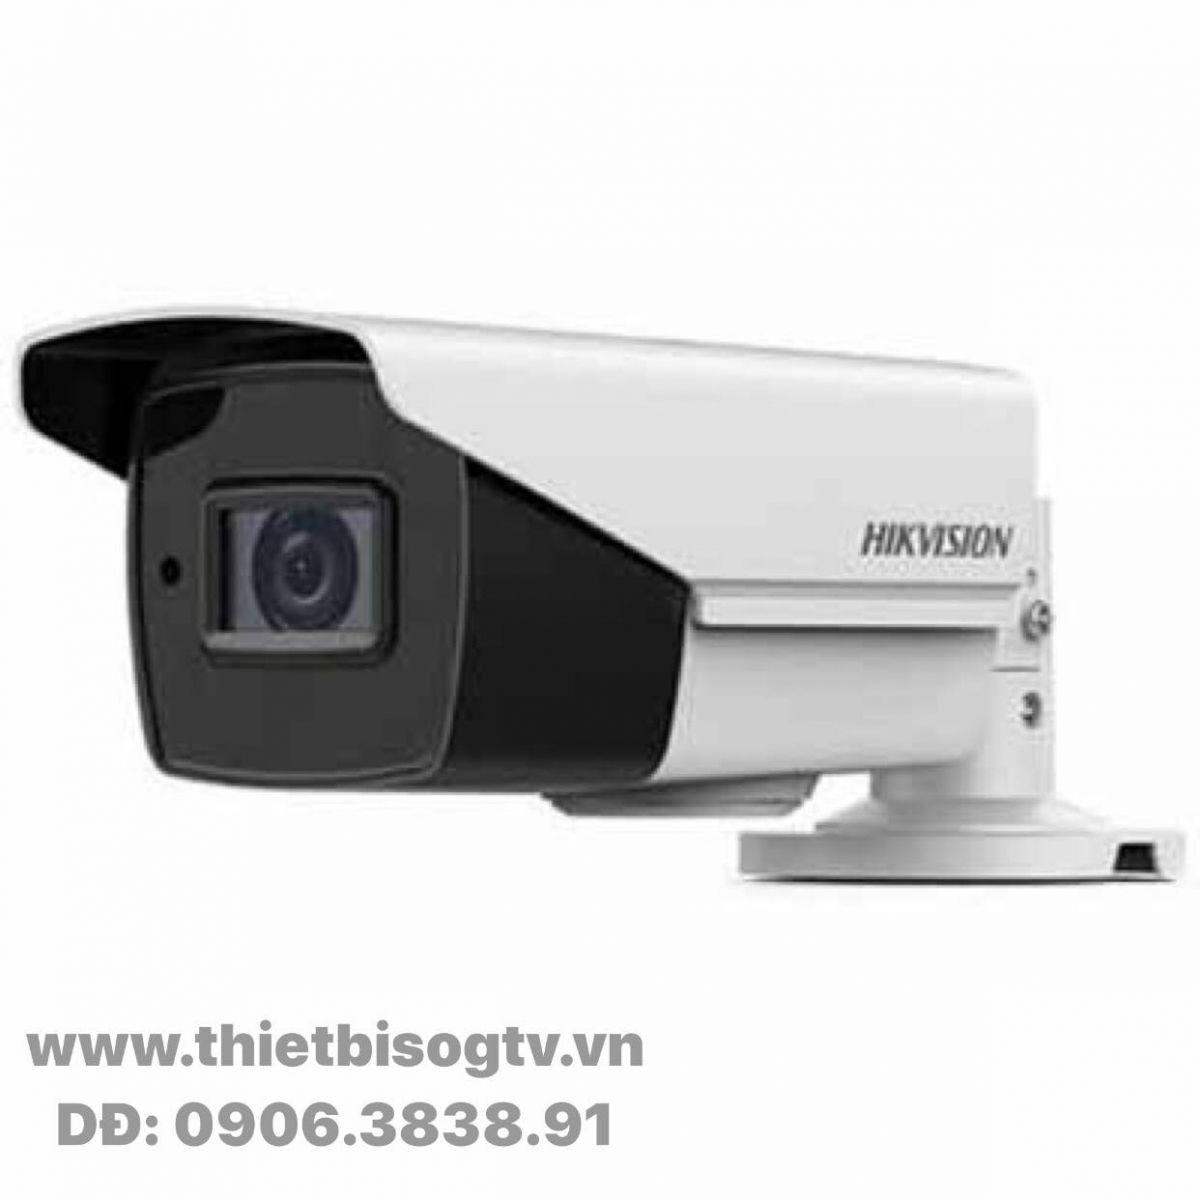 camera hikvision tvi thân ds-2ce19h8t-it3z (f)